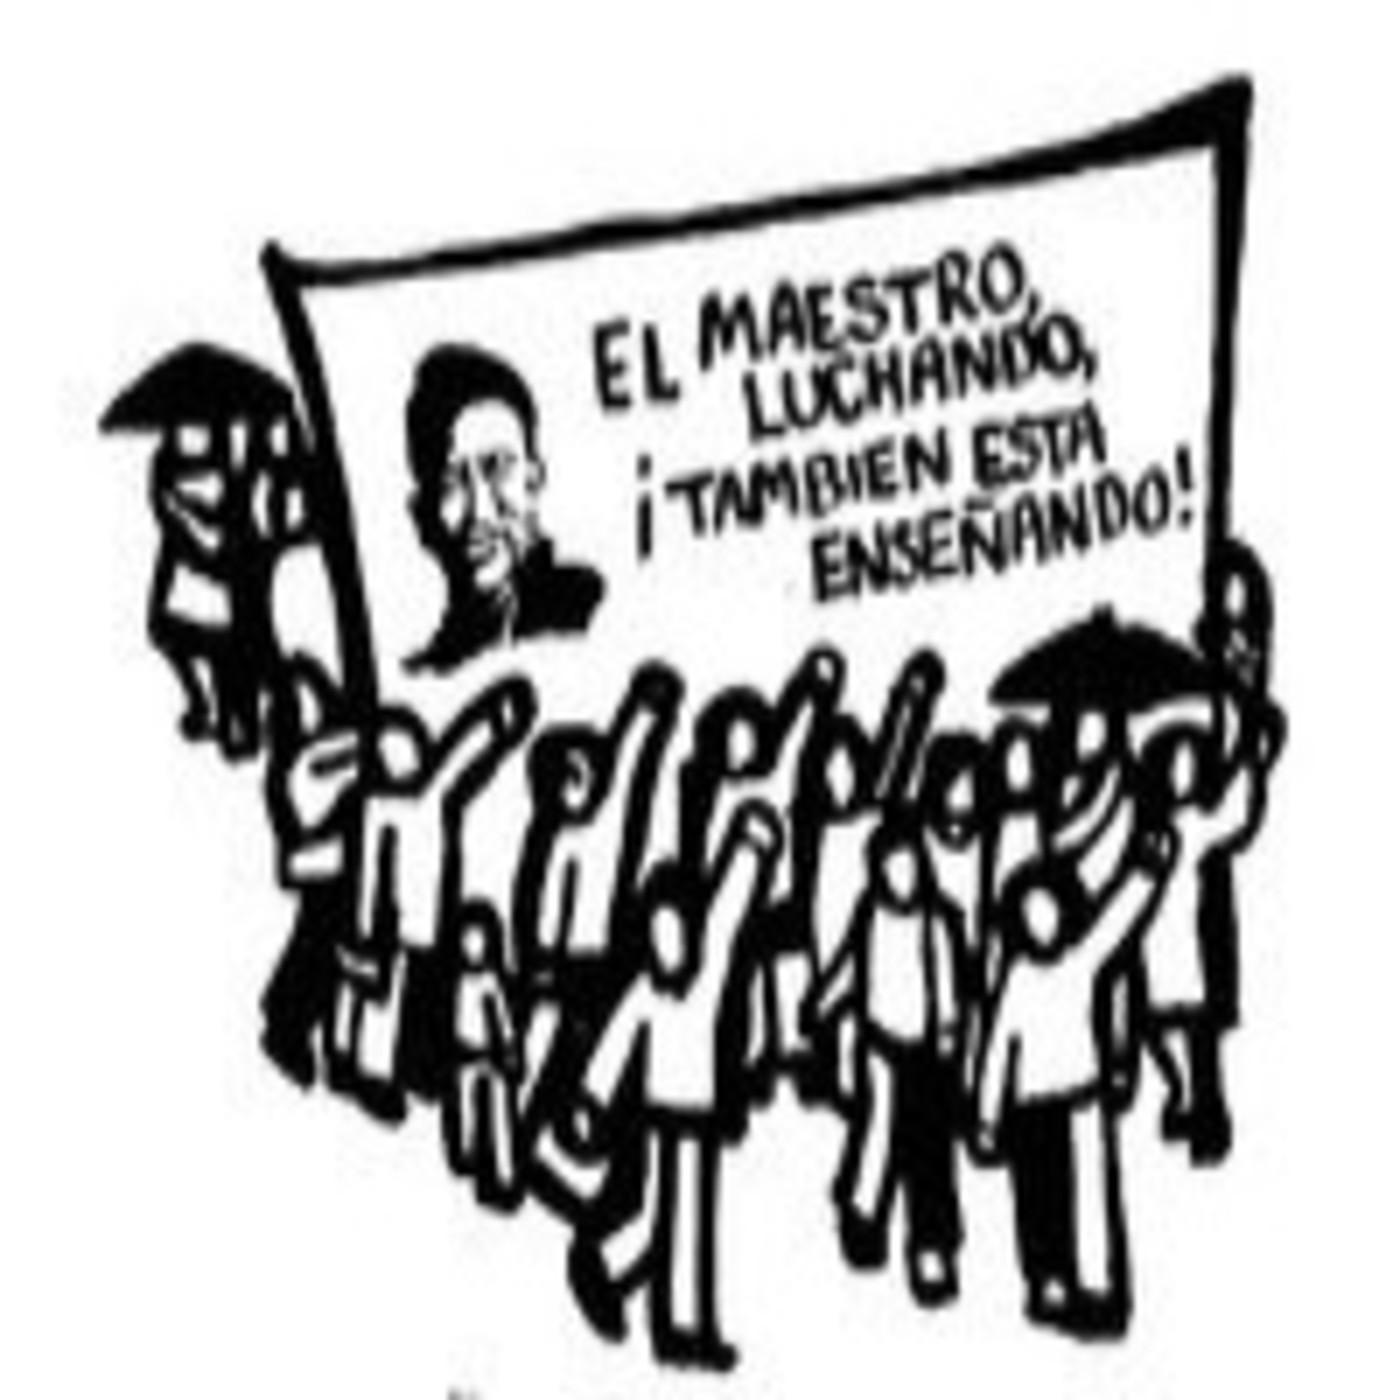 Utopodcast - La Reforma Educativa en México 2013